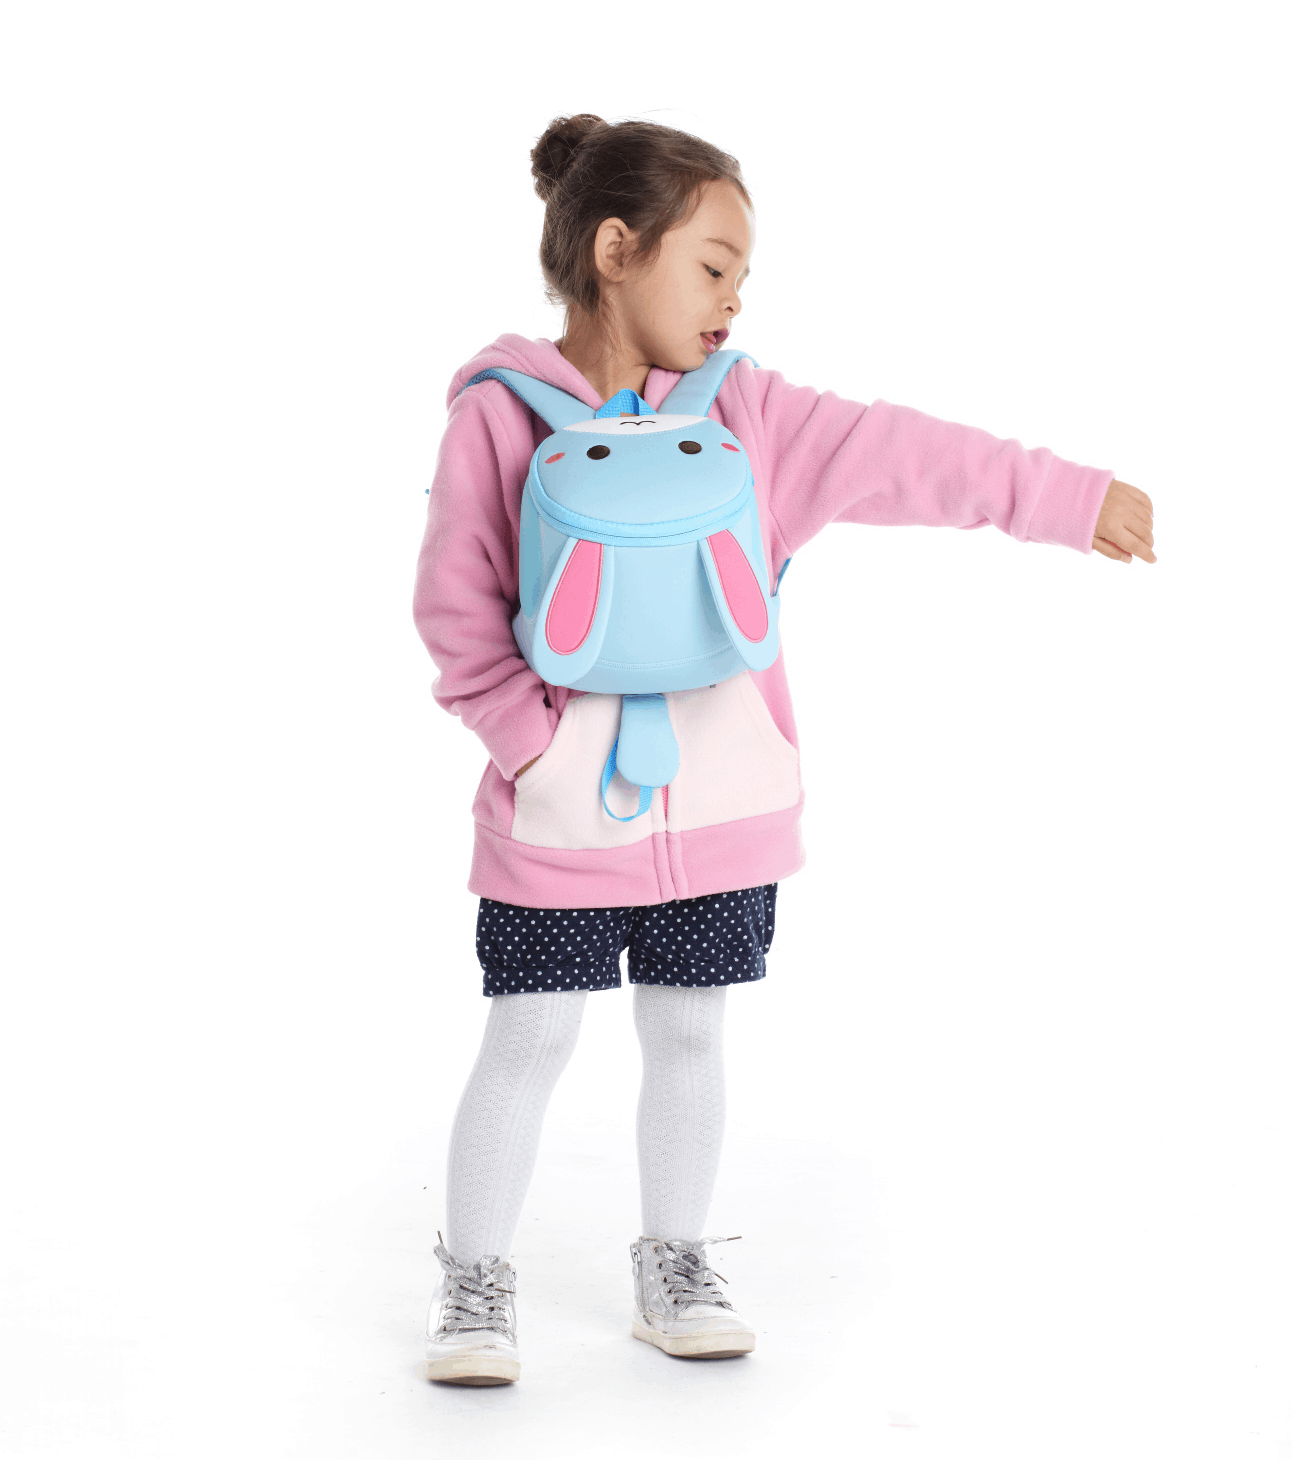 Детска 3D раница Зайче голямо с родителски контрол NoHoo BG